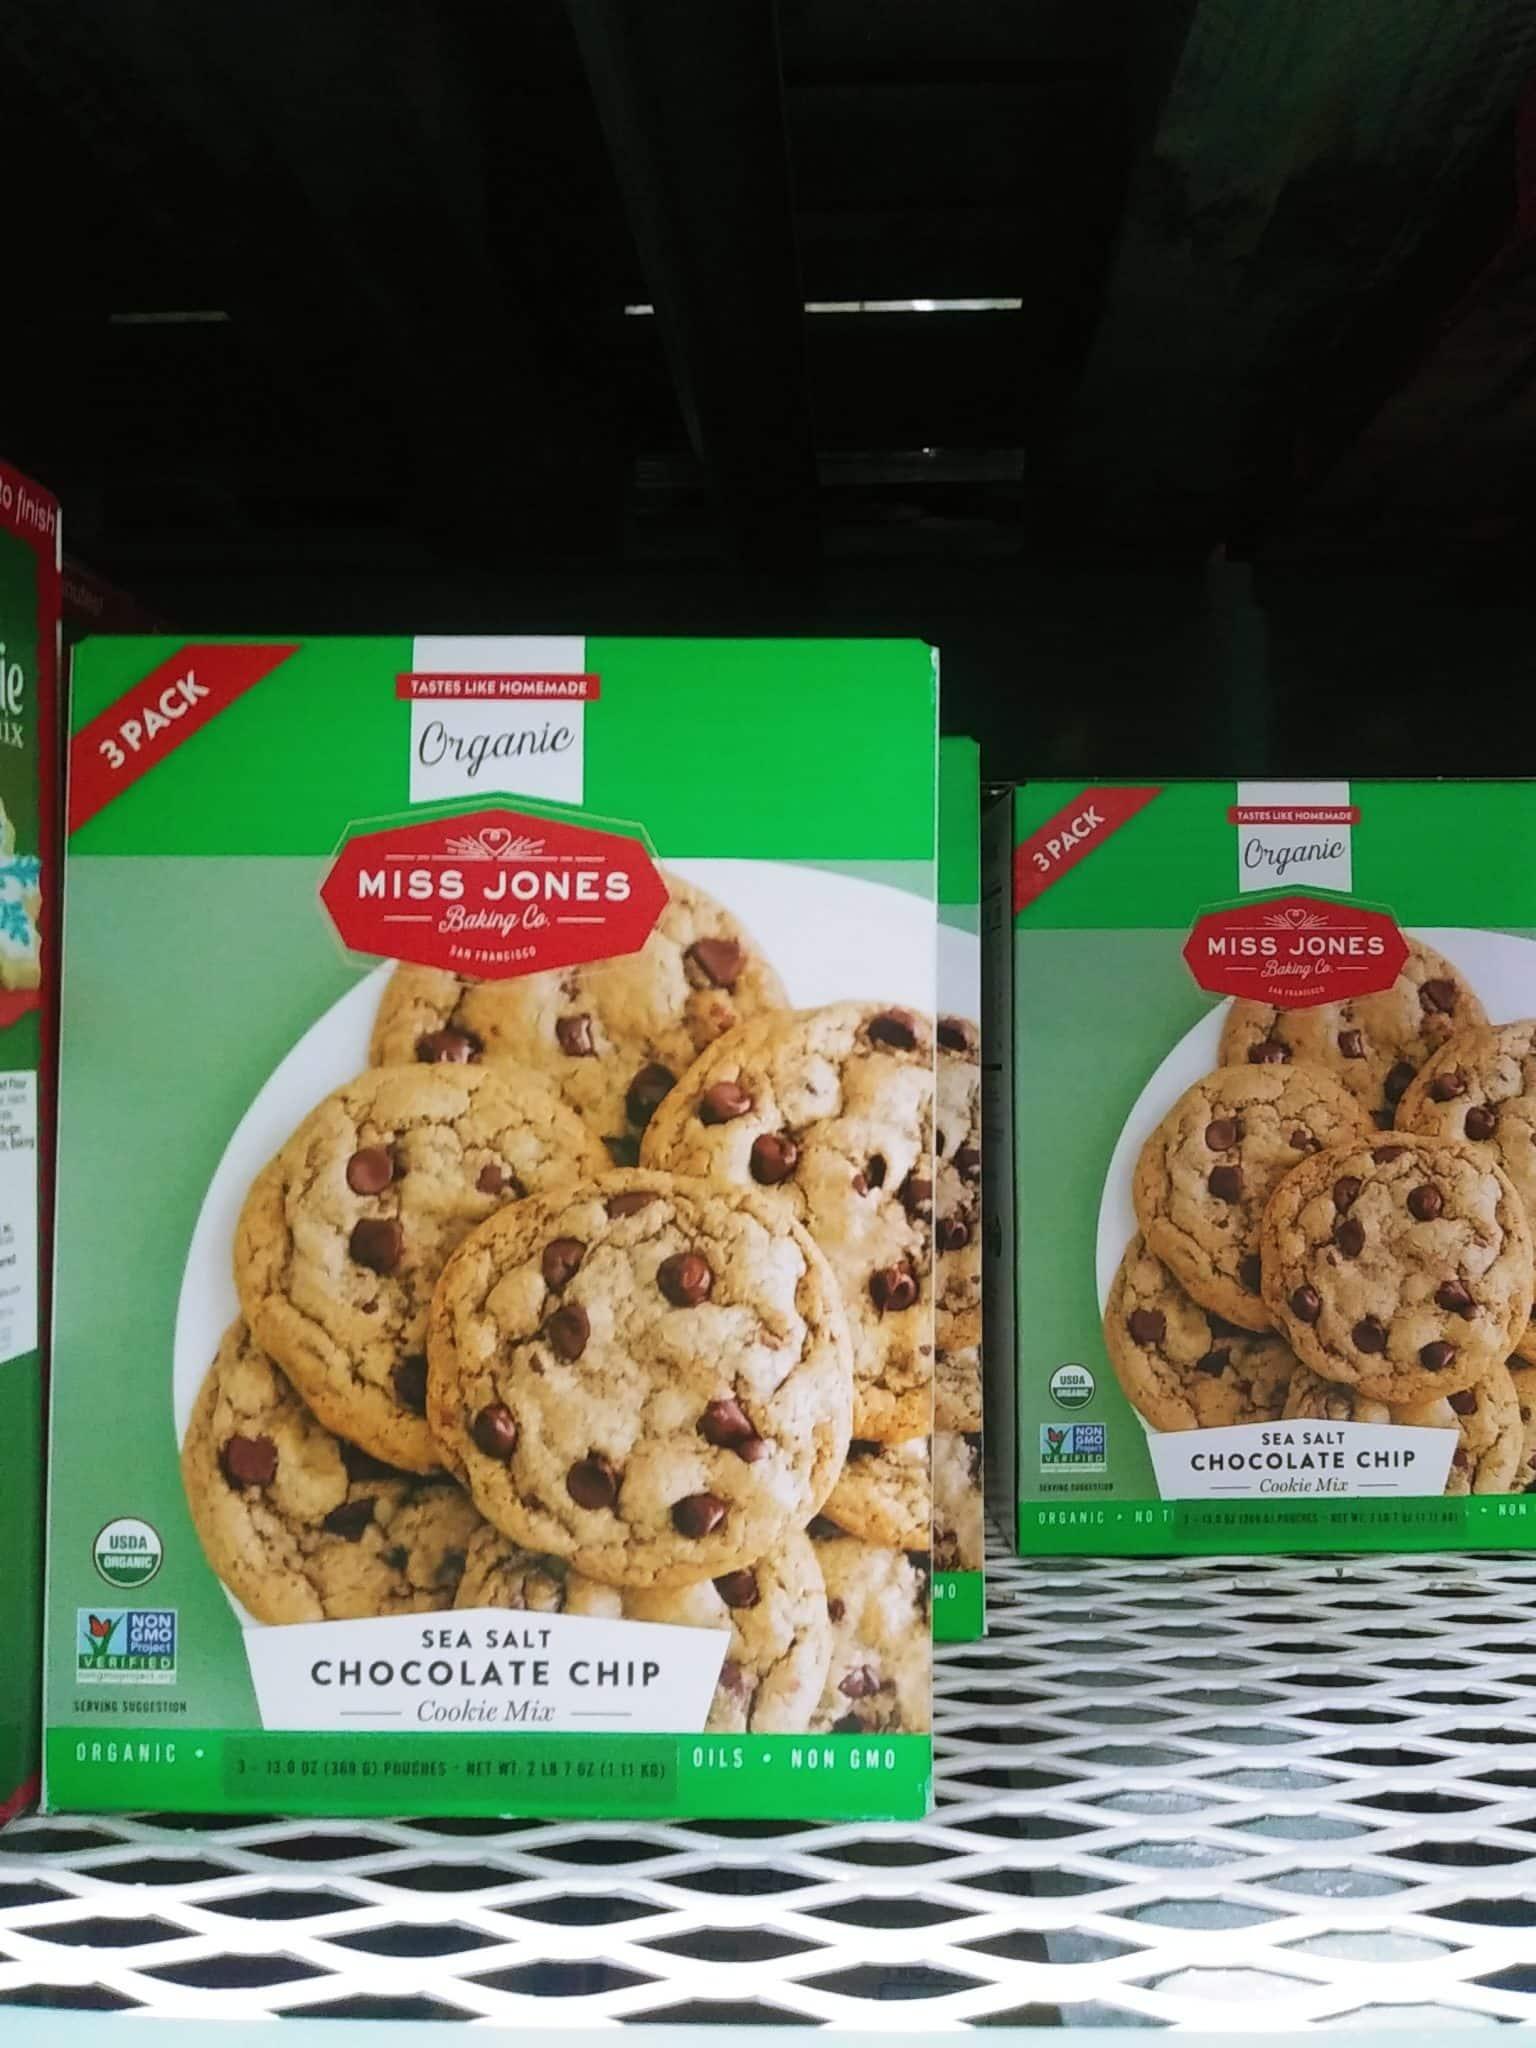 Organic Miss Jones Chocolate Chip Cookie Mix 3pk $4.99